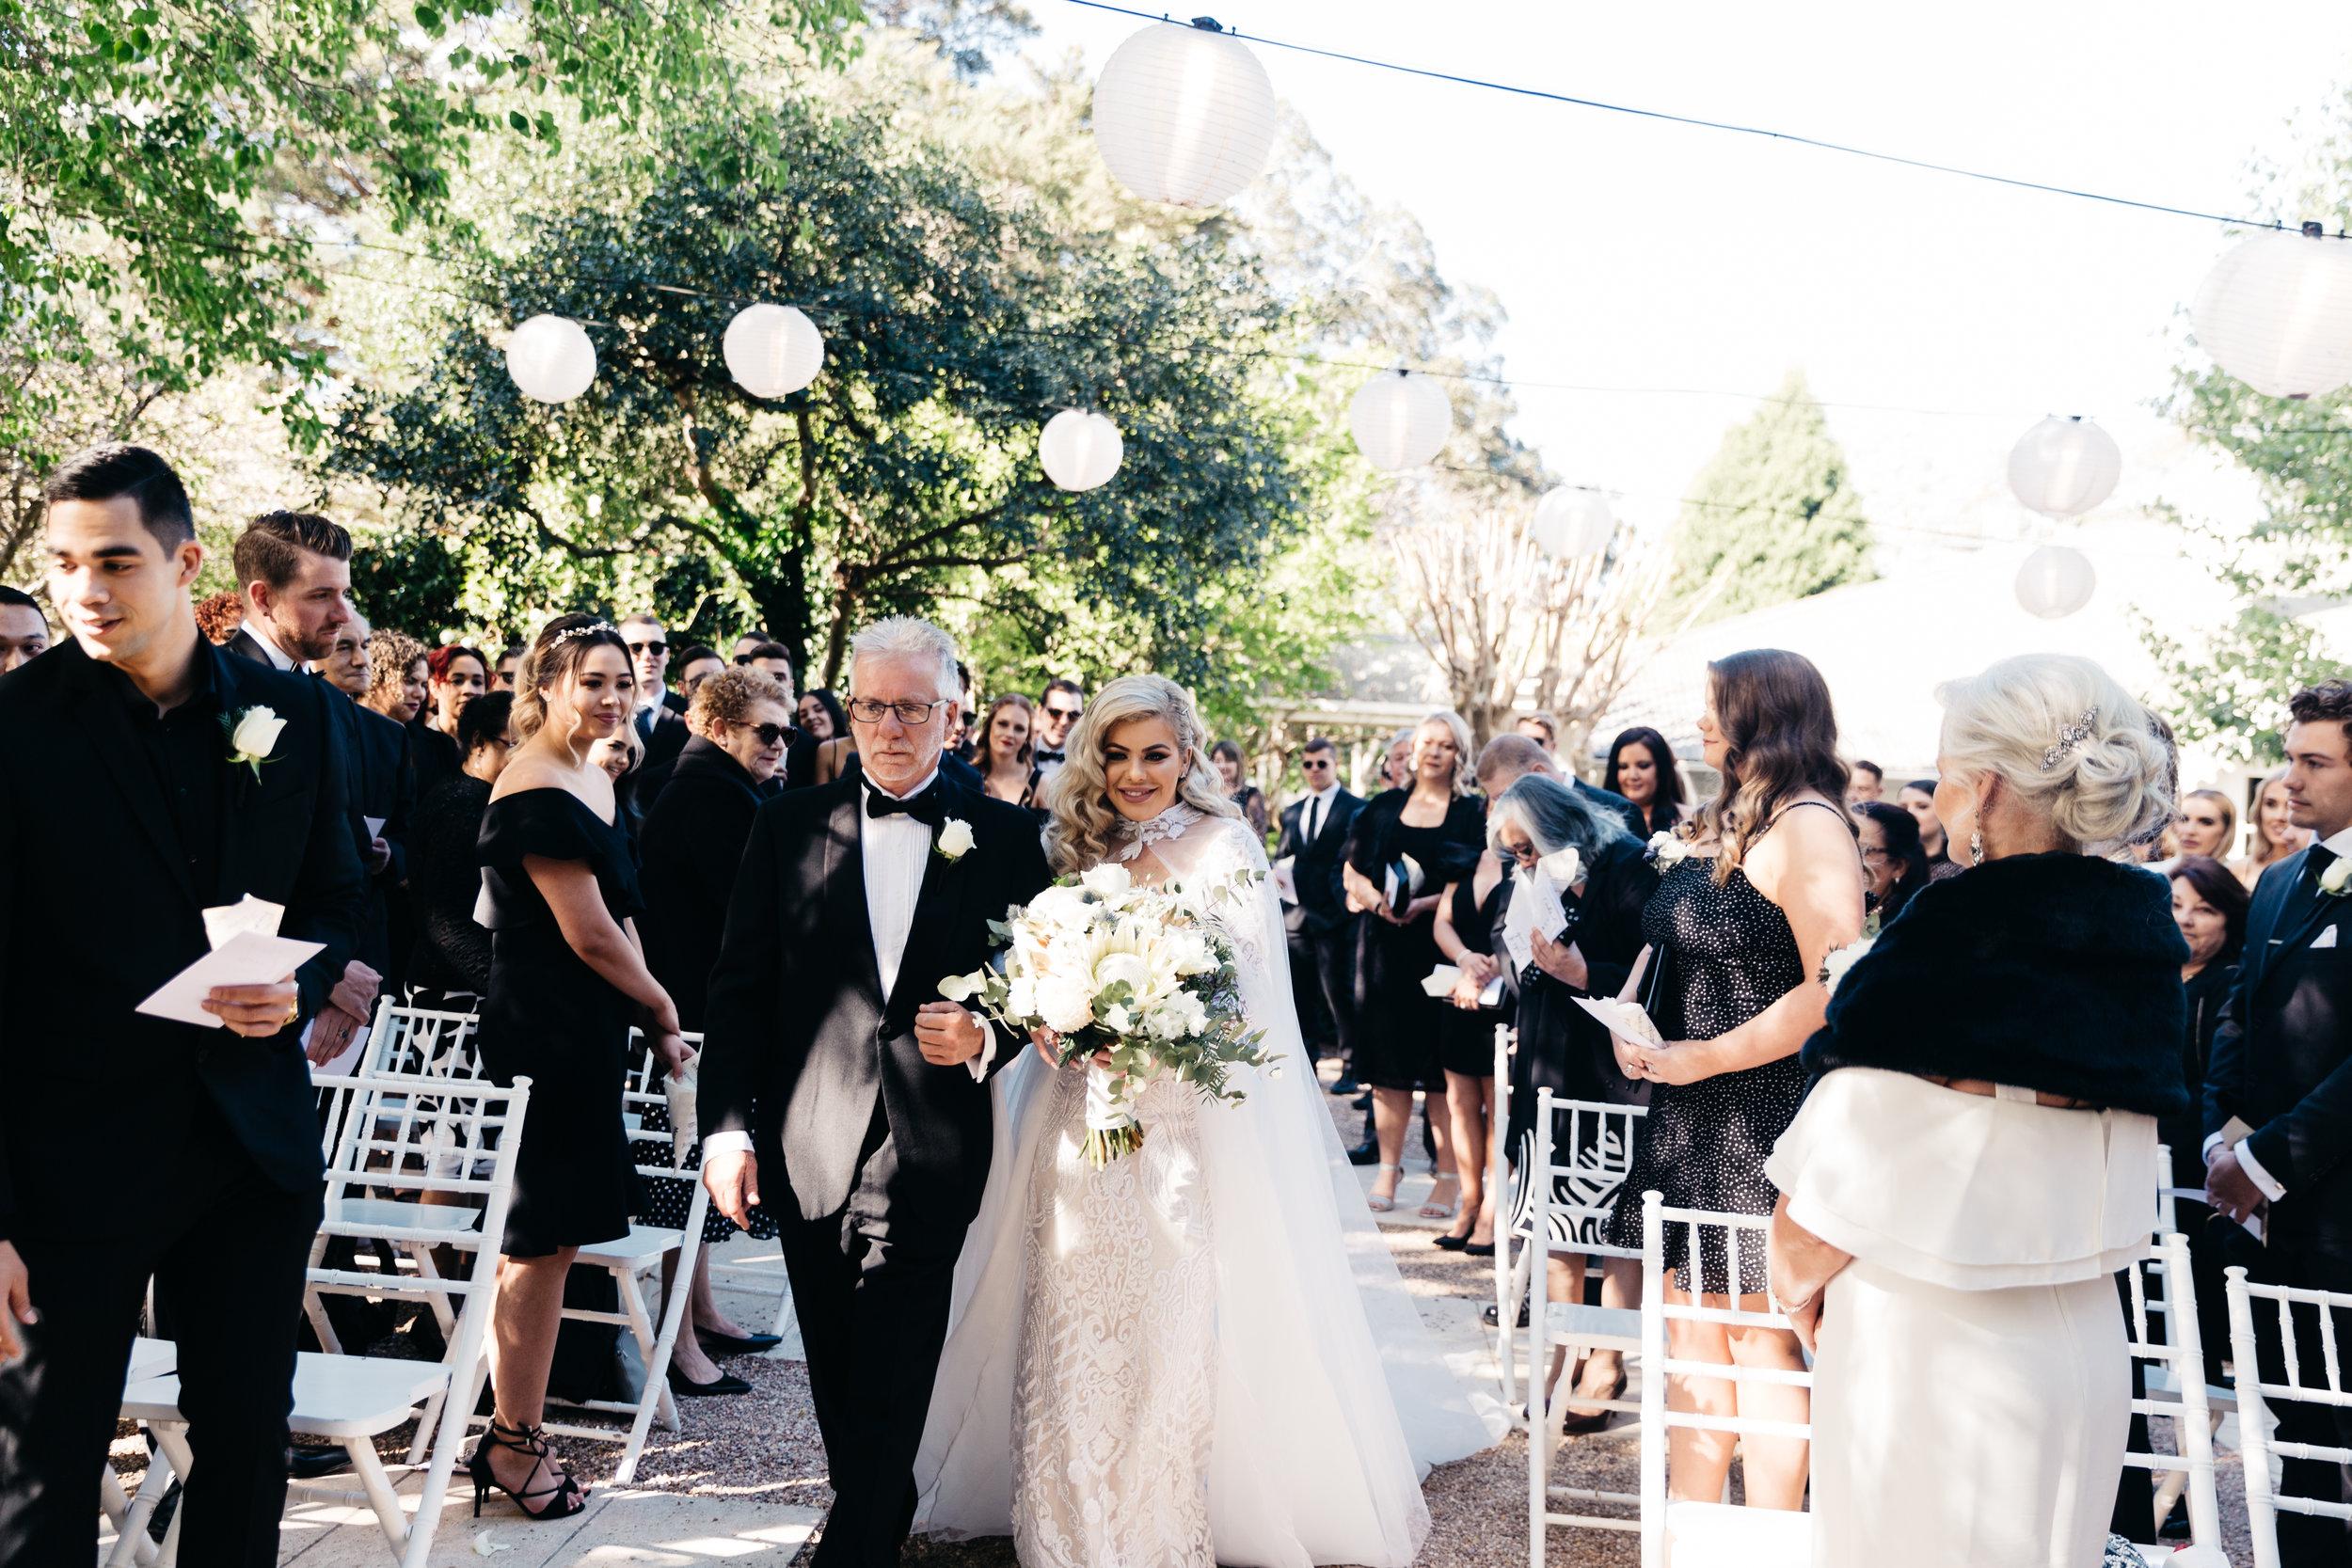 jandc_wedding-235.jpg